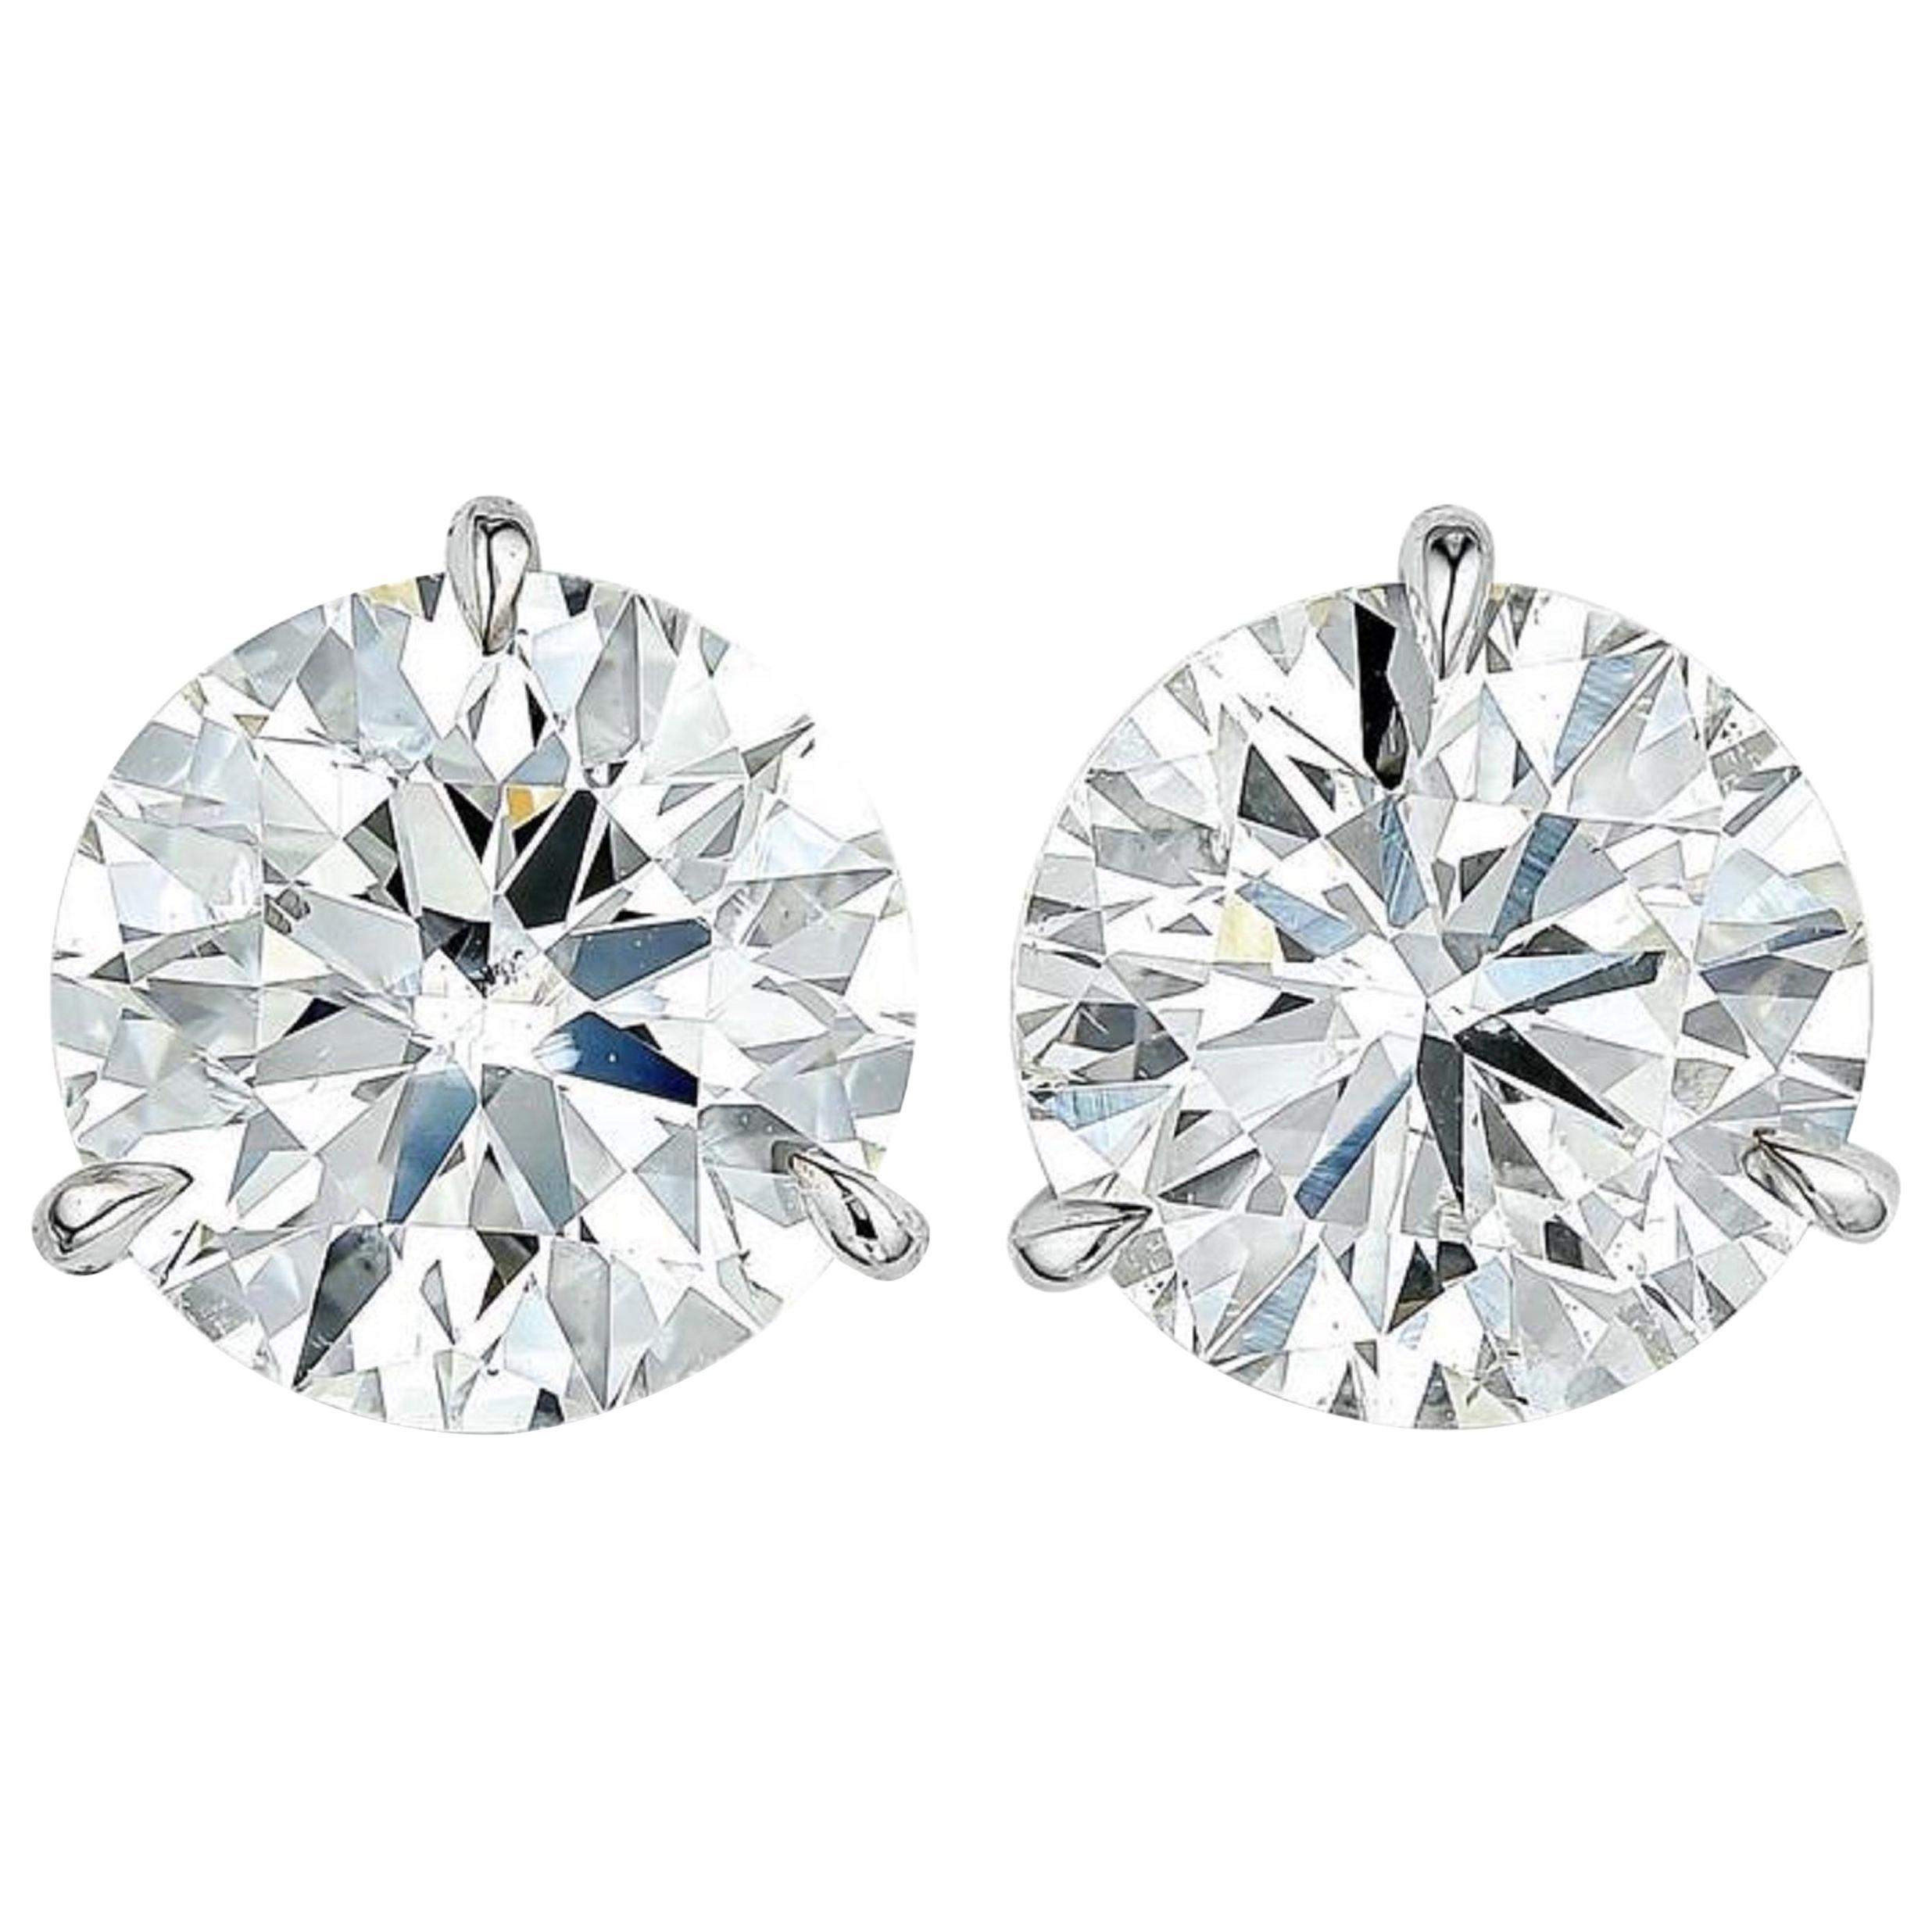 INTERNALLY FLAWLESS/VVS D Color GIA Certified 3 Carat Brilliant Diamond Studs